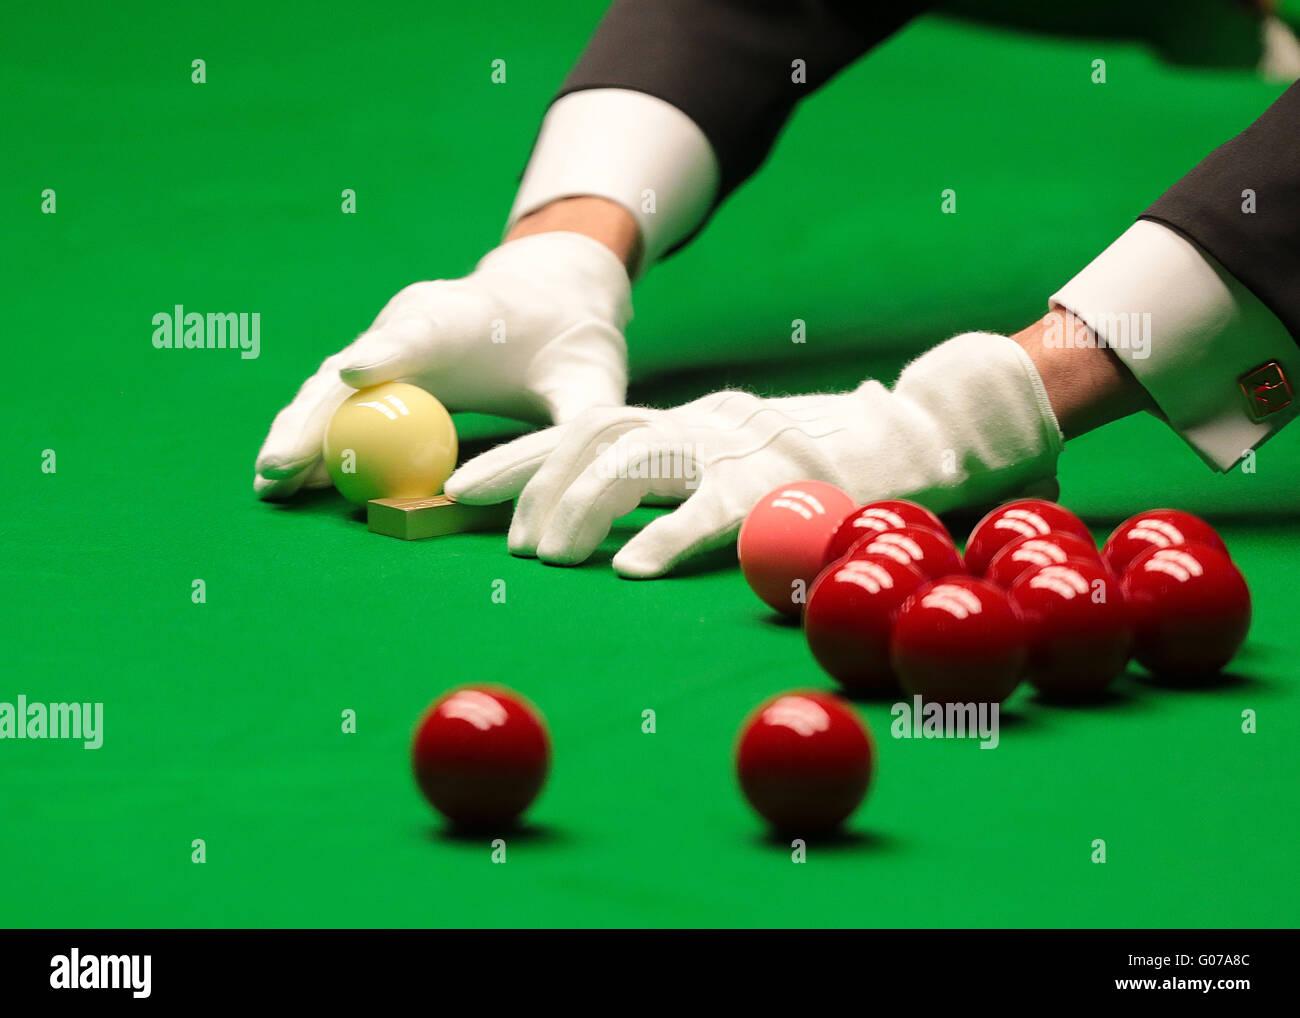 El crisol, Sheffield, Reino Unido. 30 abr, 2016. World Snooker Championship. Semifinales, Ding Junhui versus Alan Imagen De Stock